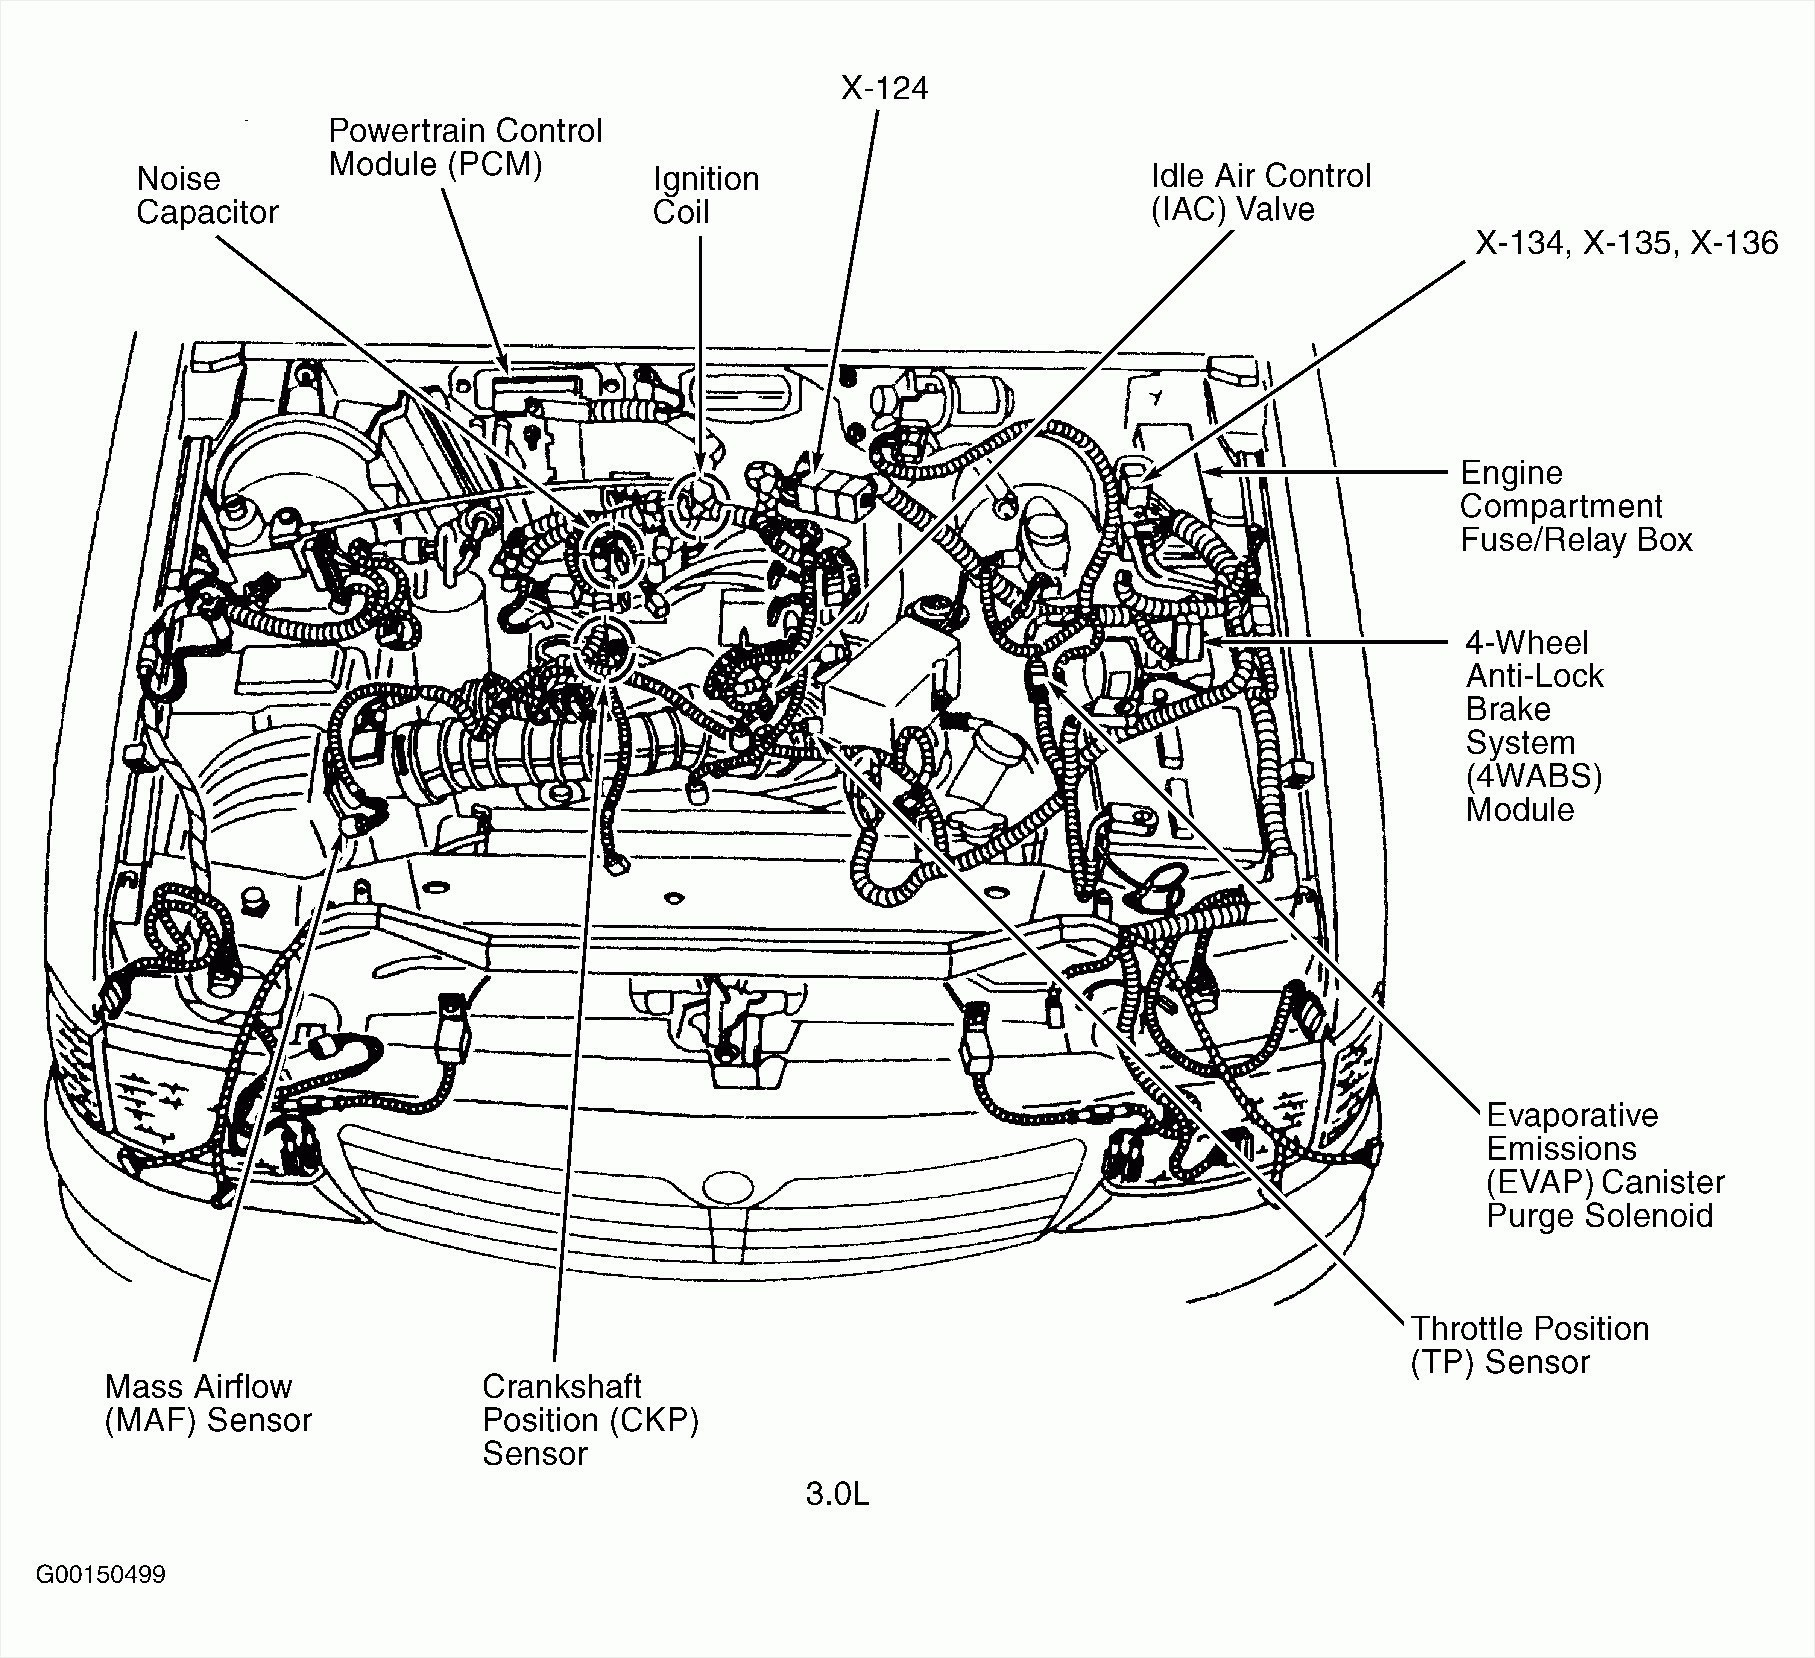 1986 ford F150 Under Hood Diagram Diagram] 1966 ford Vacuum Line Diagram Full Version Hd Of 1986 ford F150 Under Hood Diagram